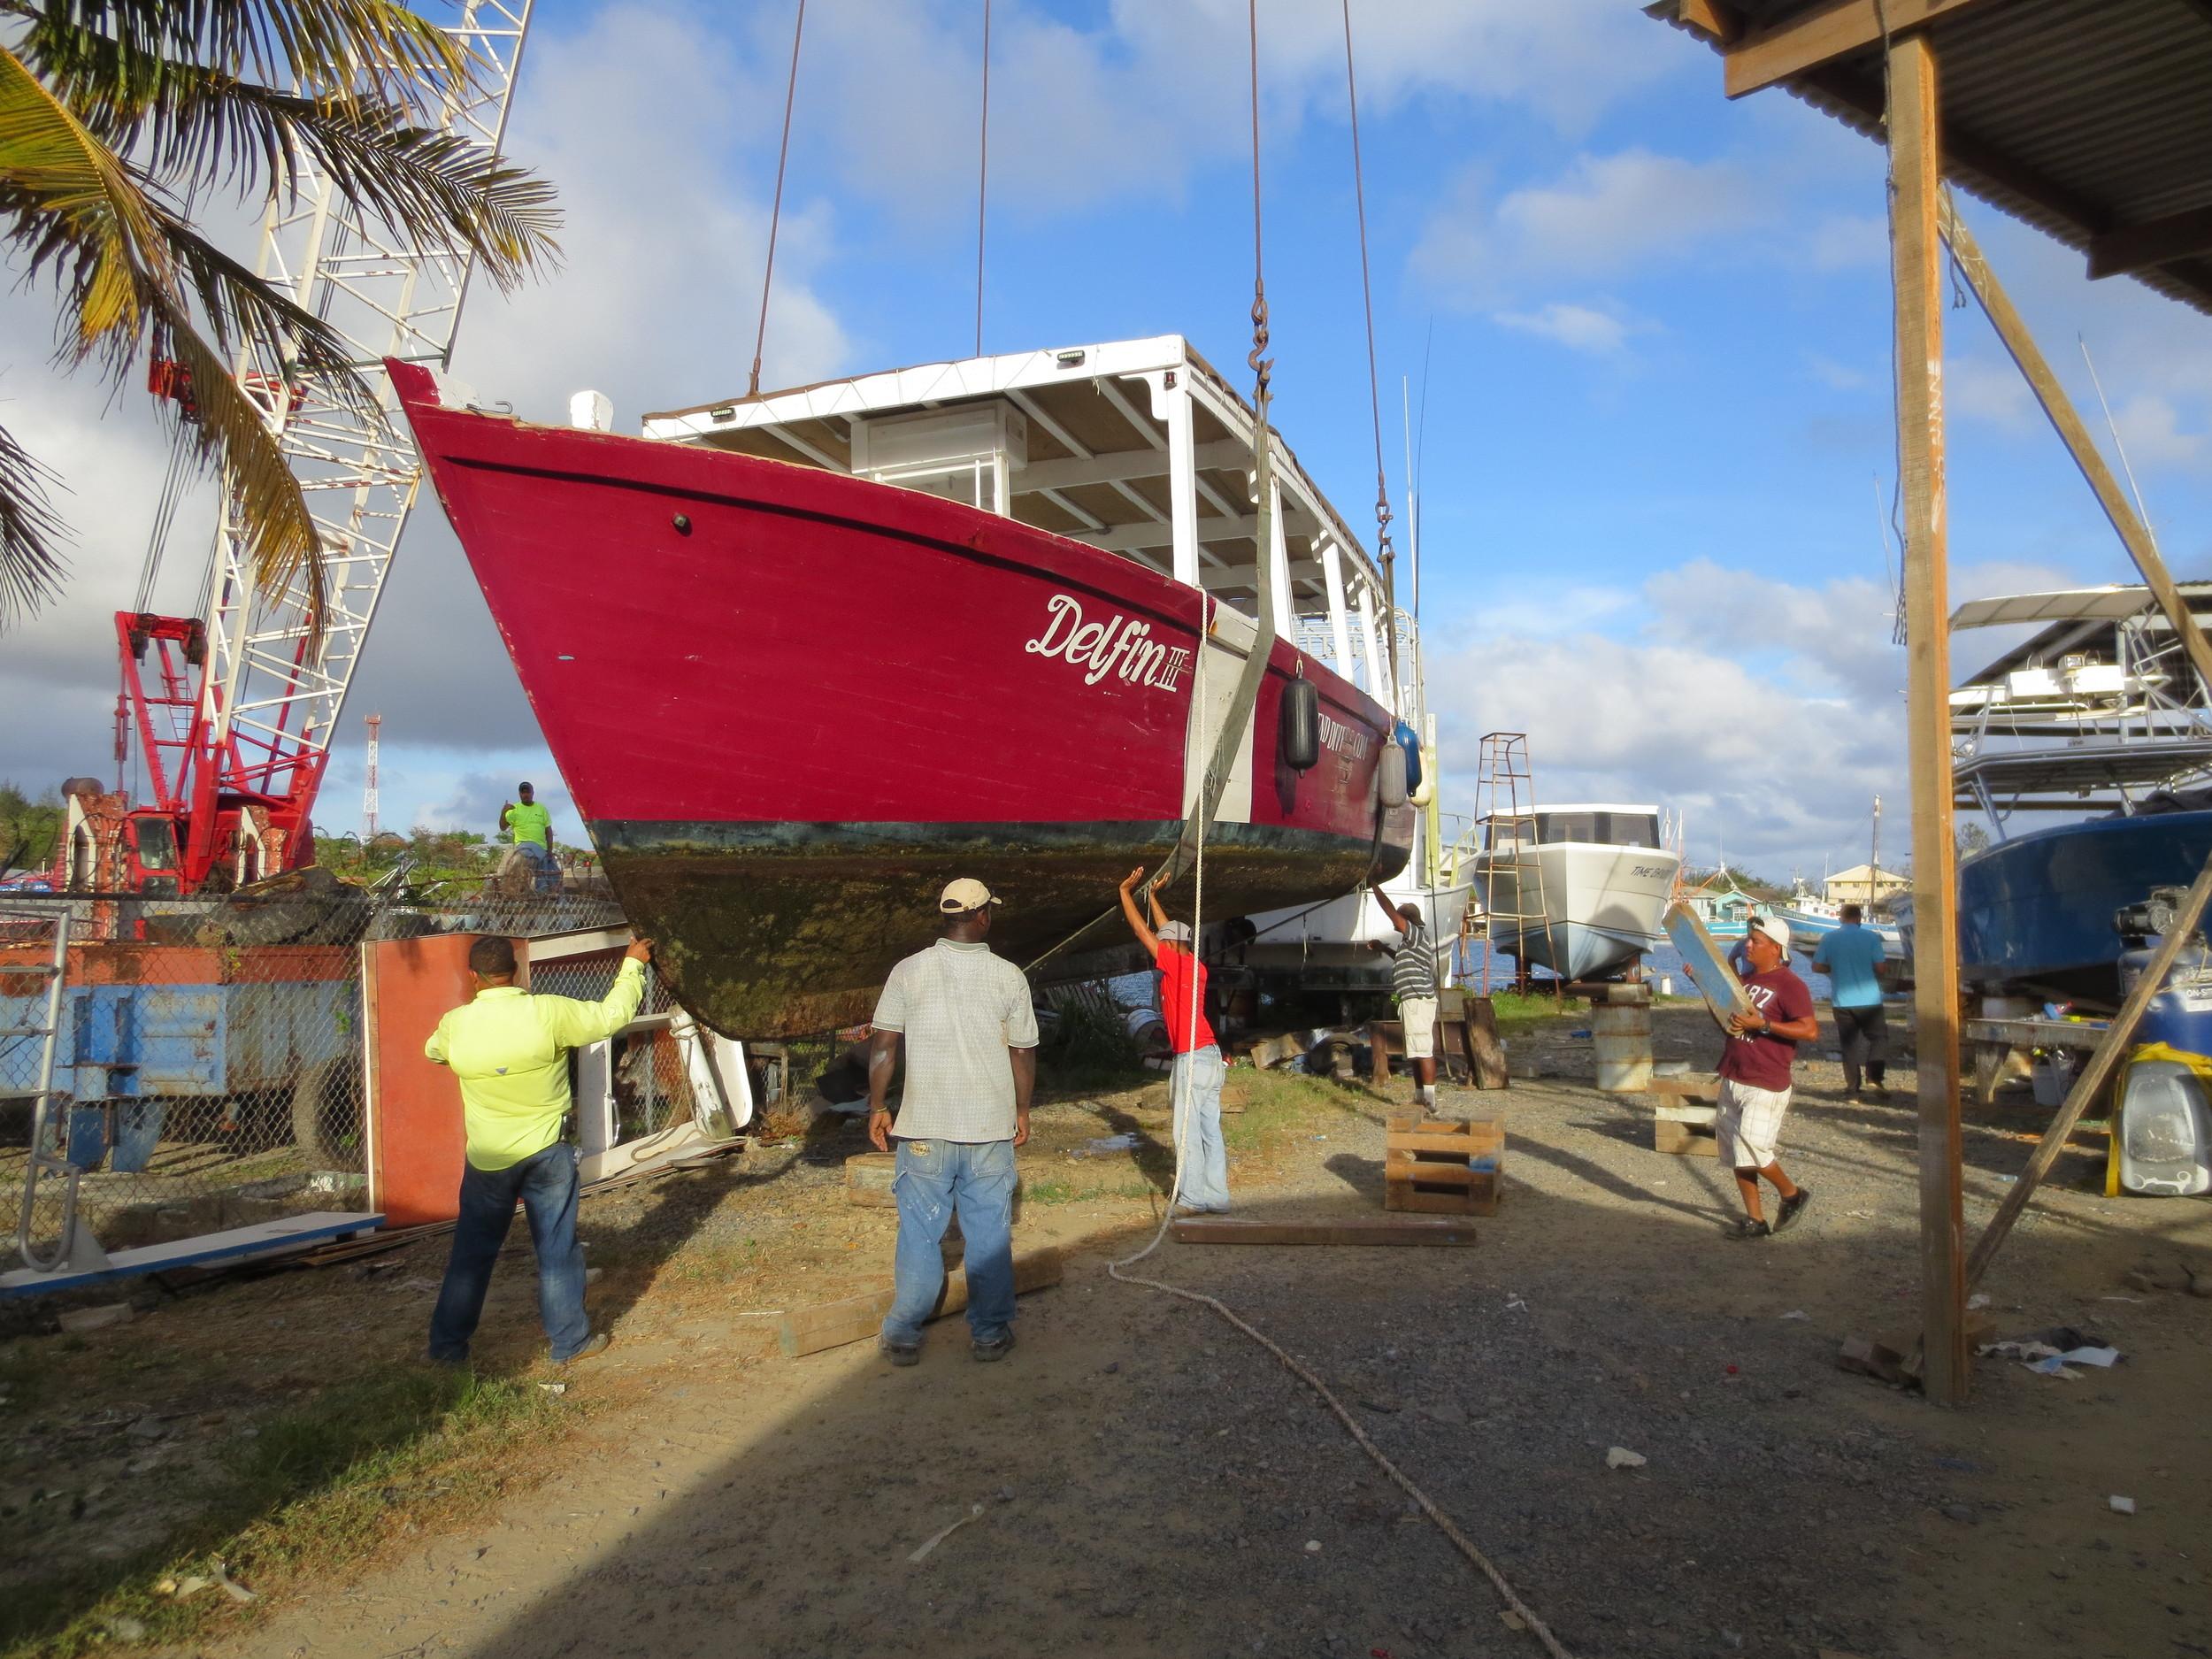 A holiday for Delfin at Martinez Shipyard